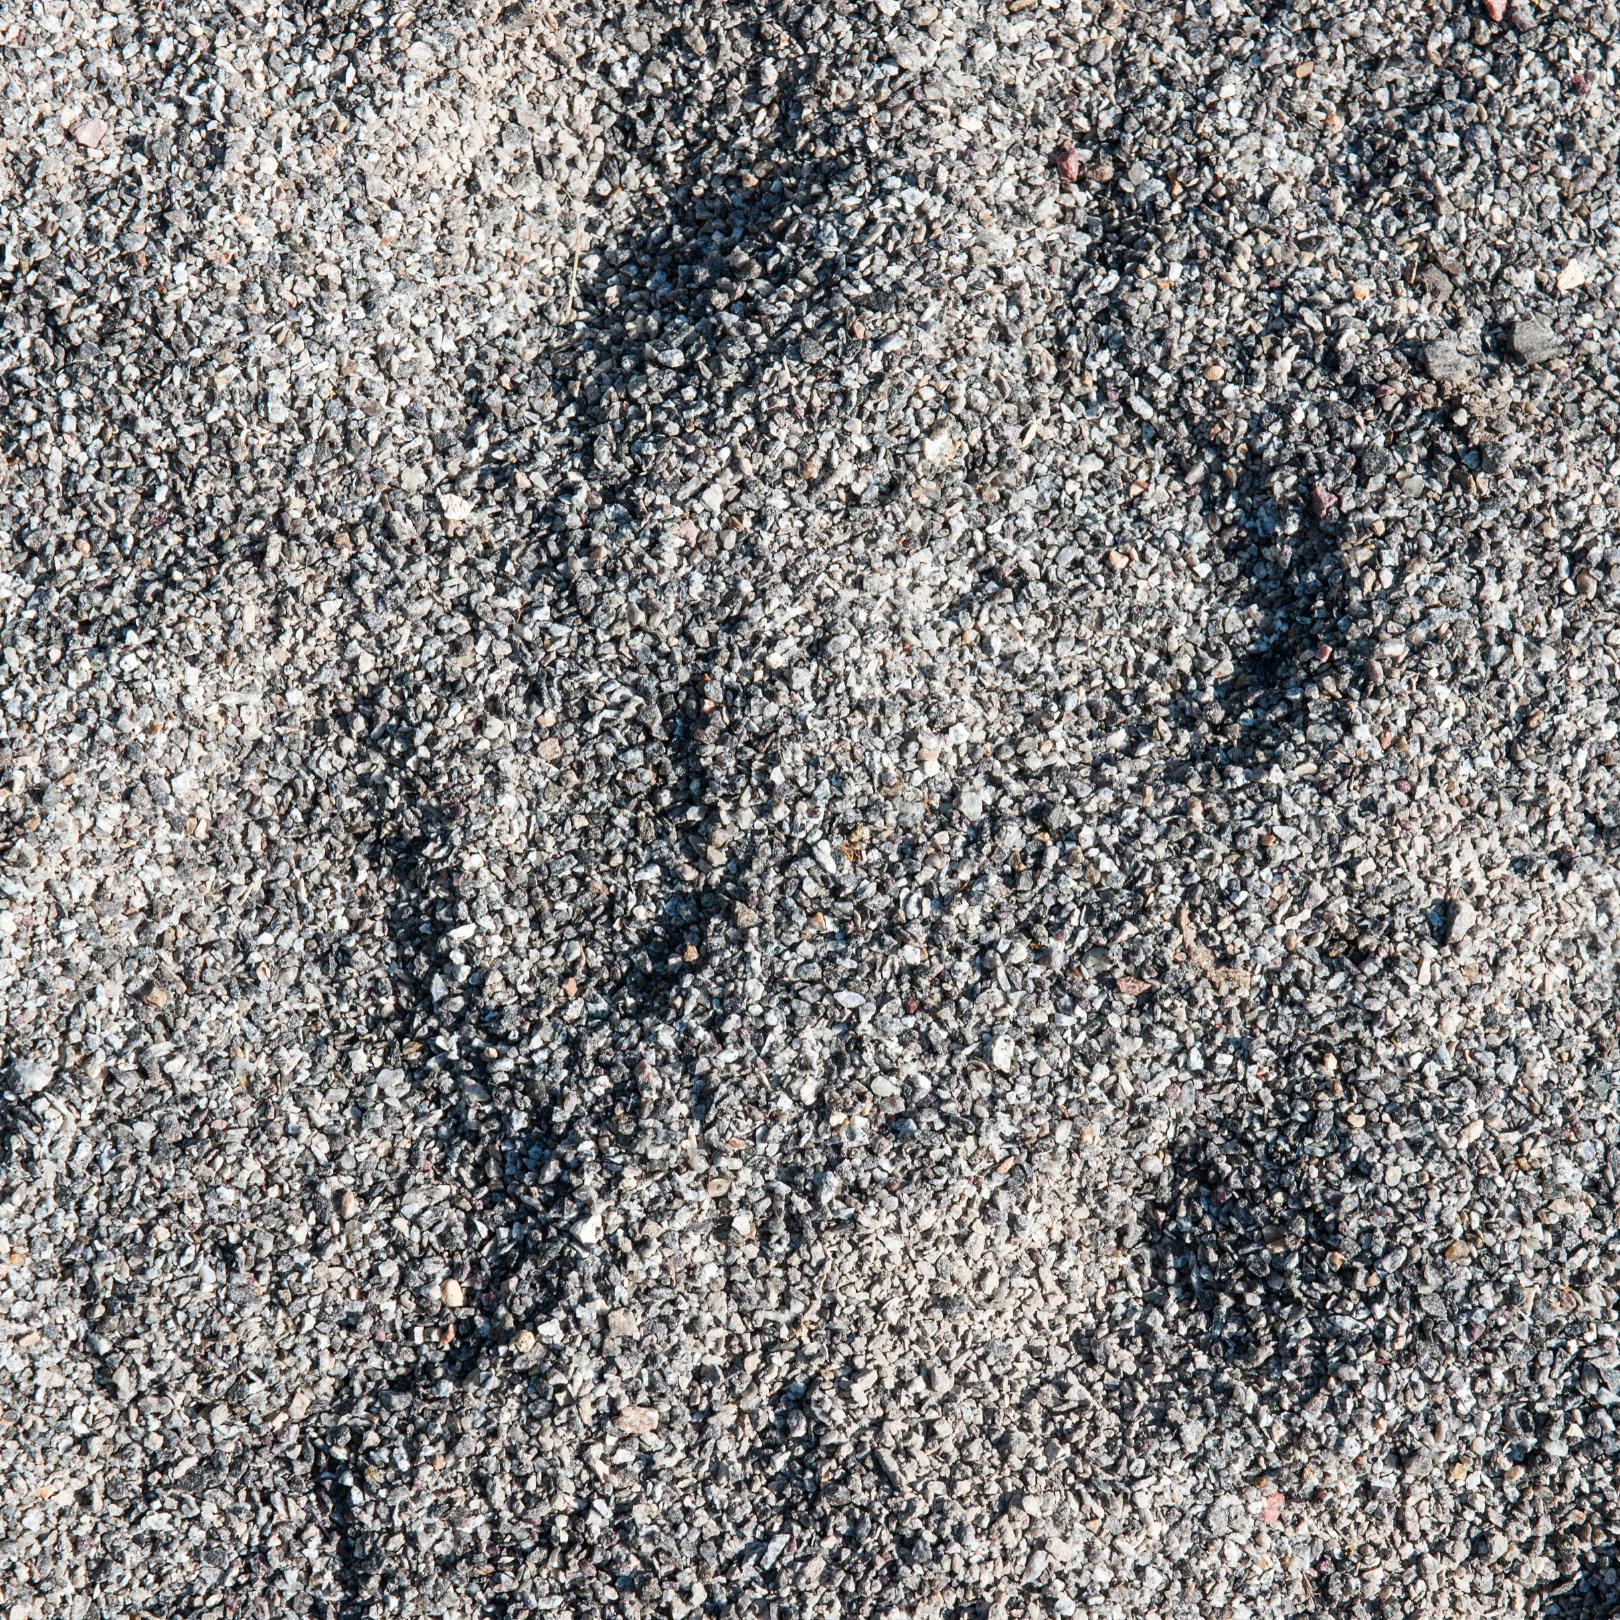 Manufactured Sand